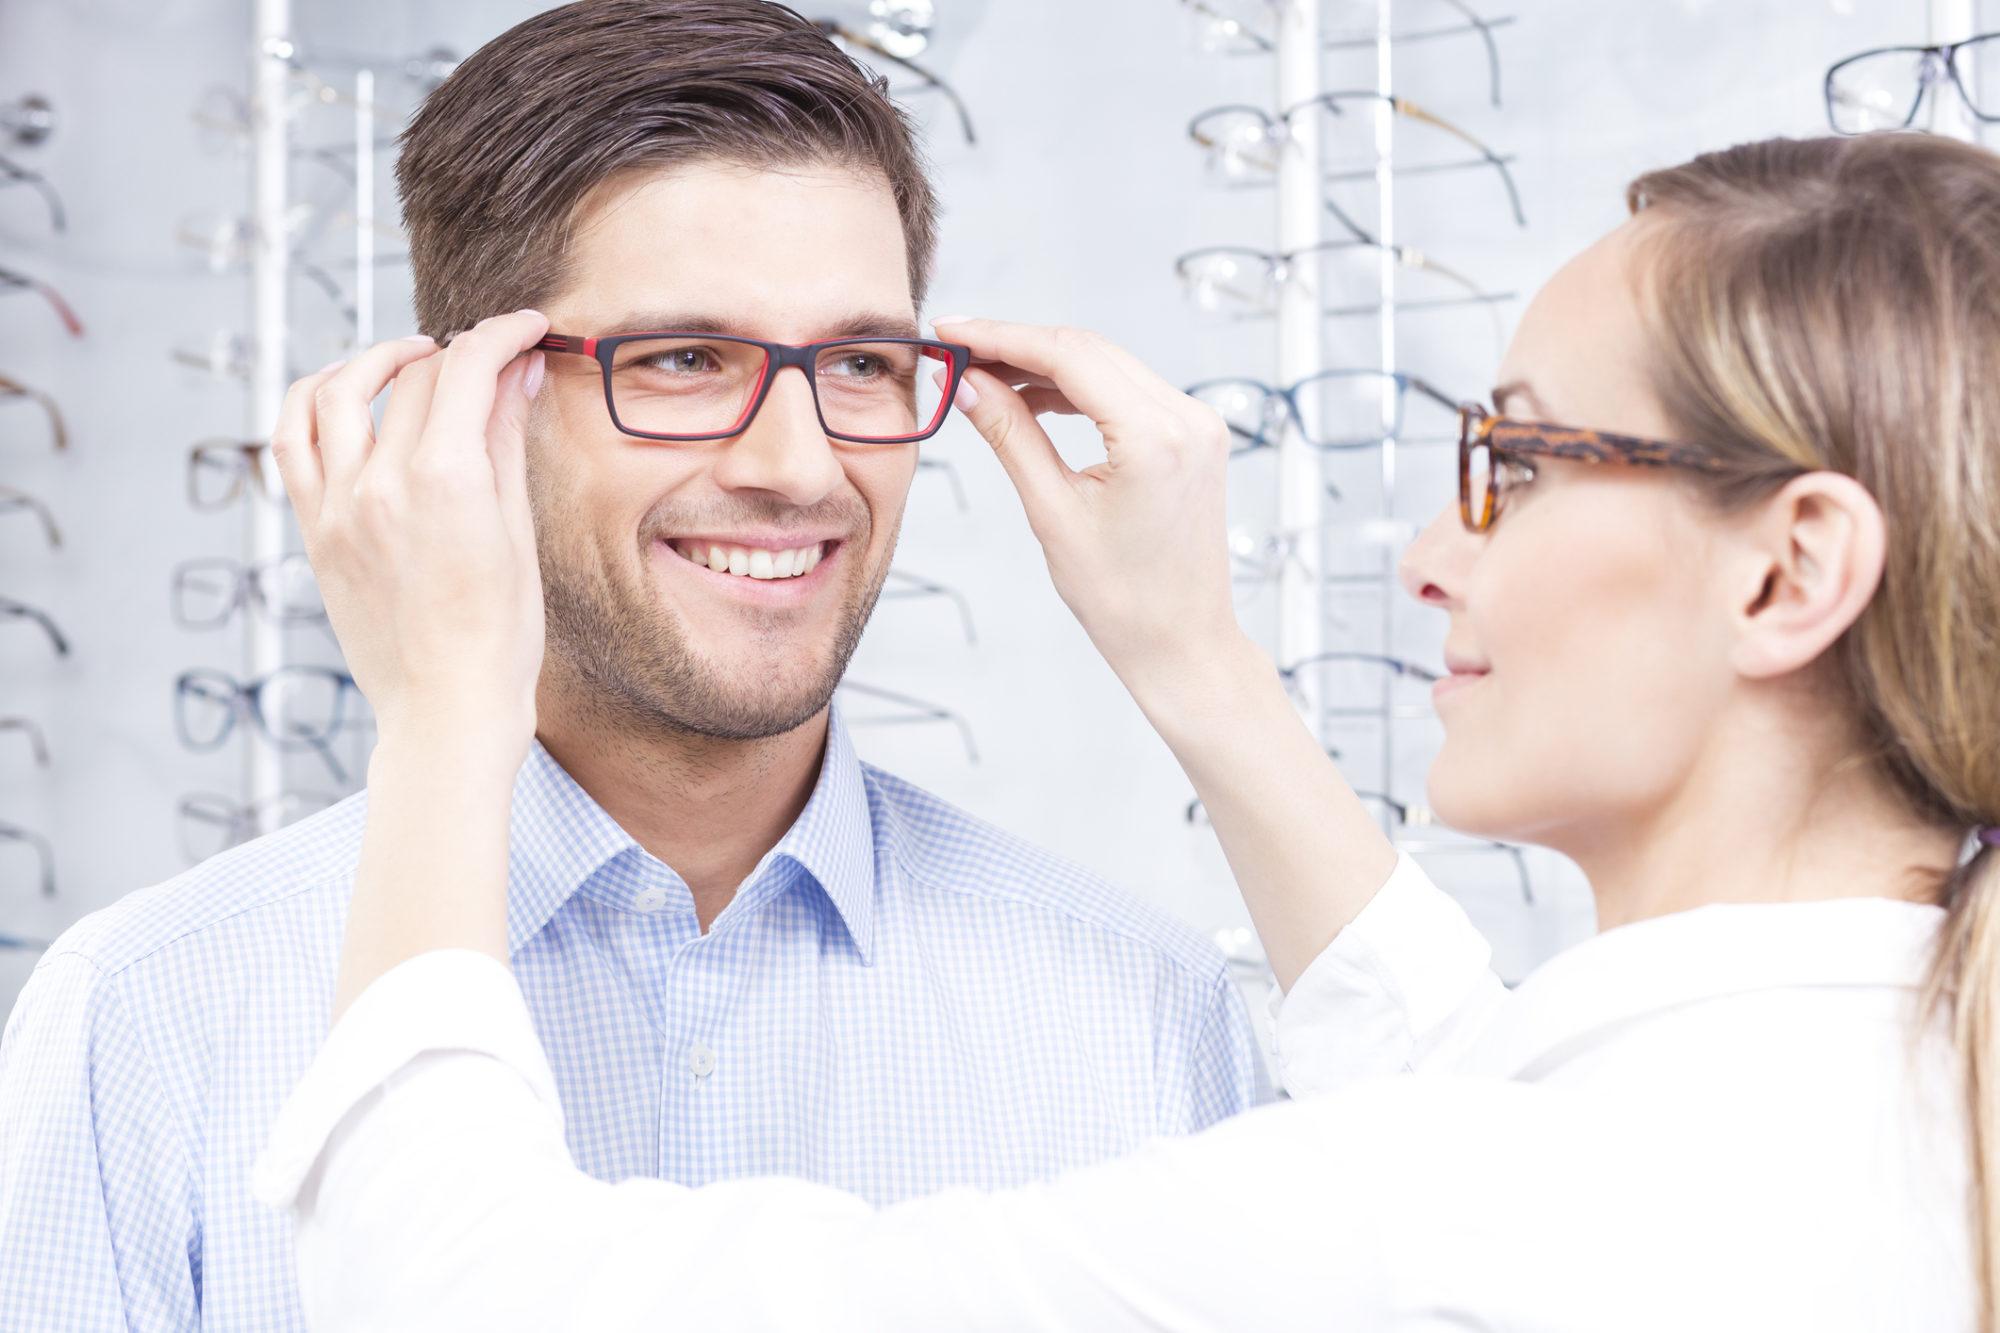 woman putting glasses on man in optical shop, optical shop Springfield MA, optometrist western MA